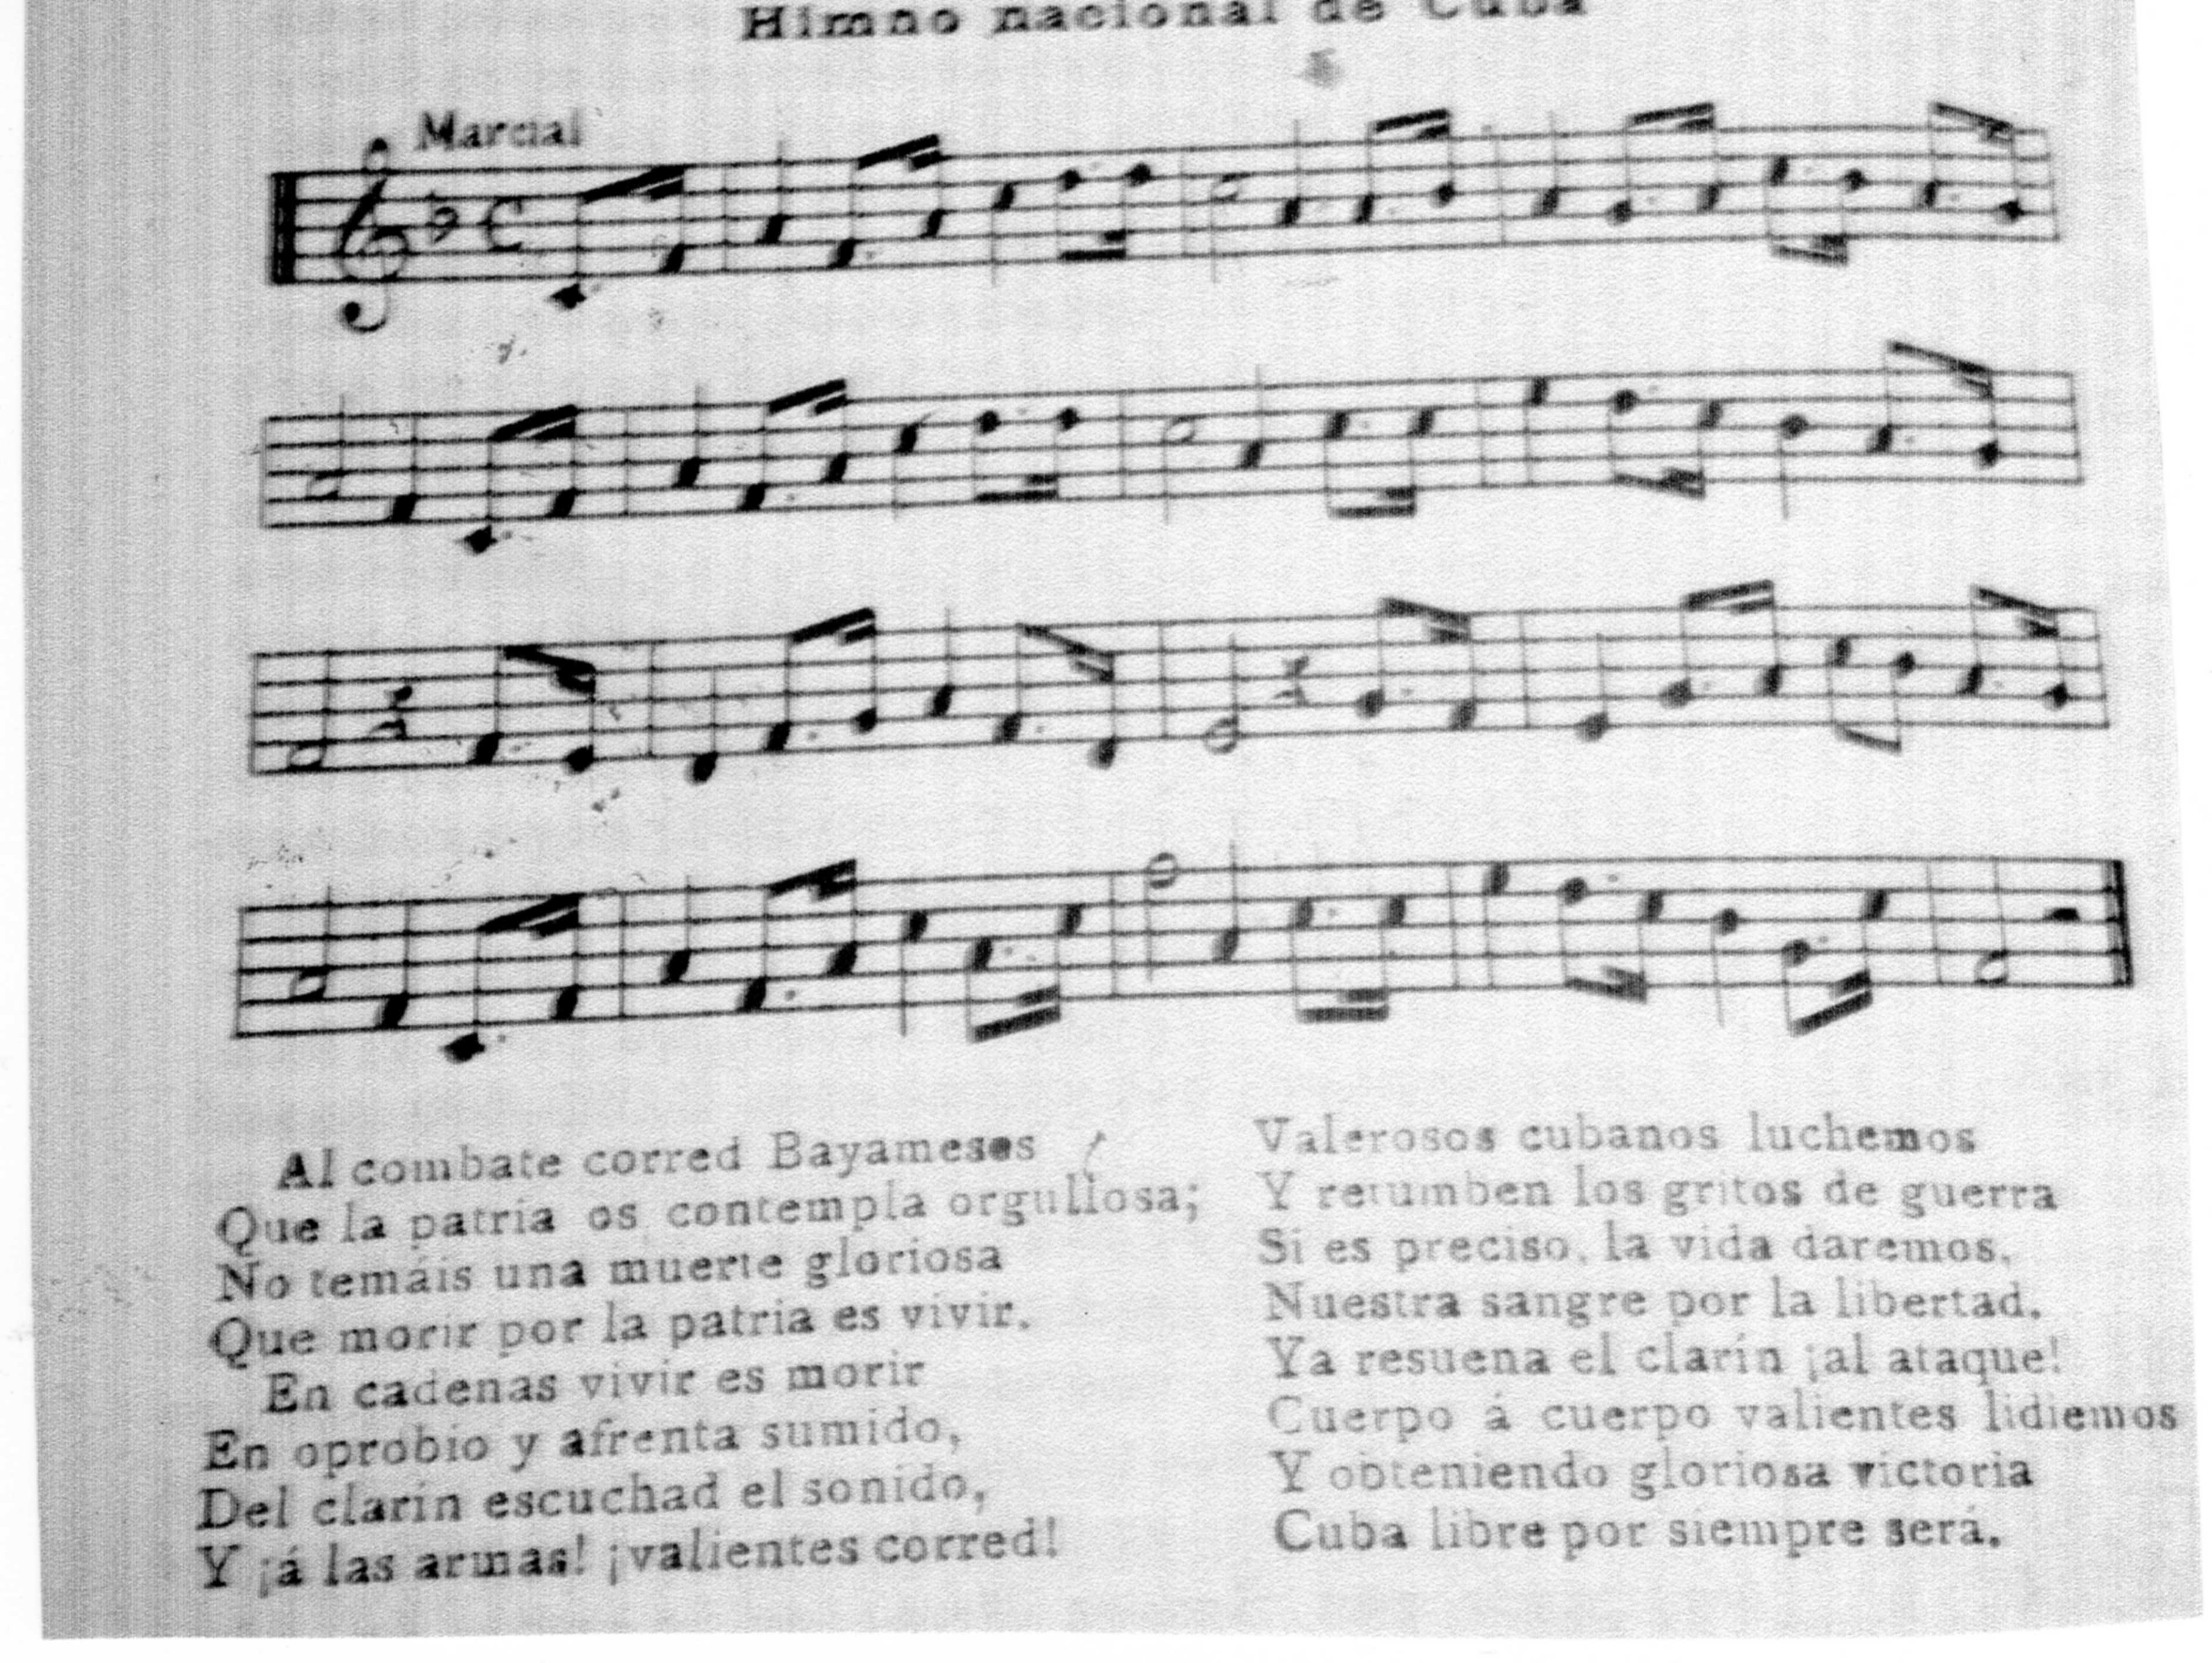 http://upload.wikimedia.org/wikipedia/commons/d/d2/Himne_de_Cuba.jpg